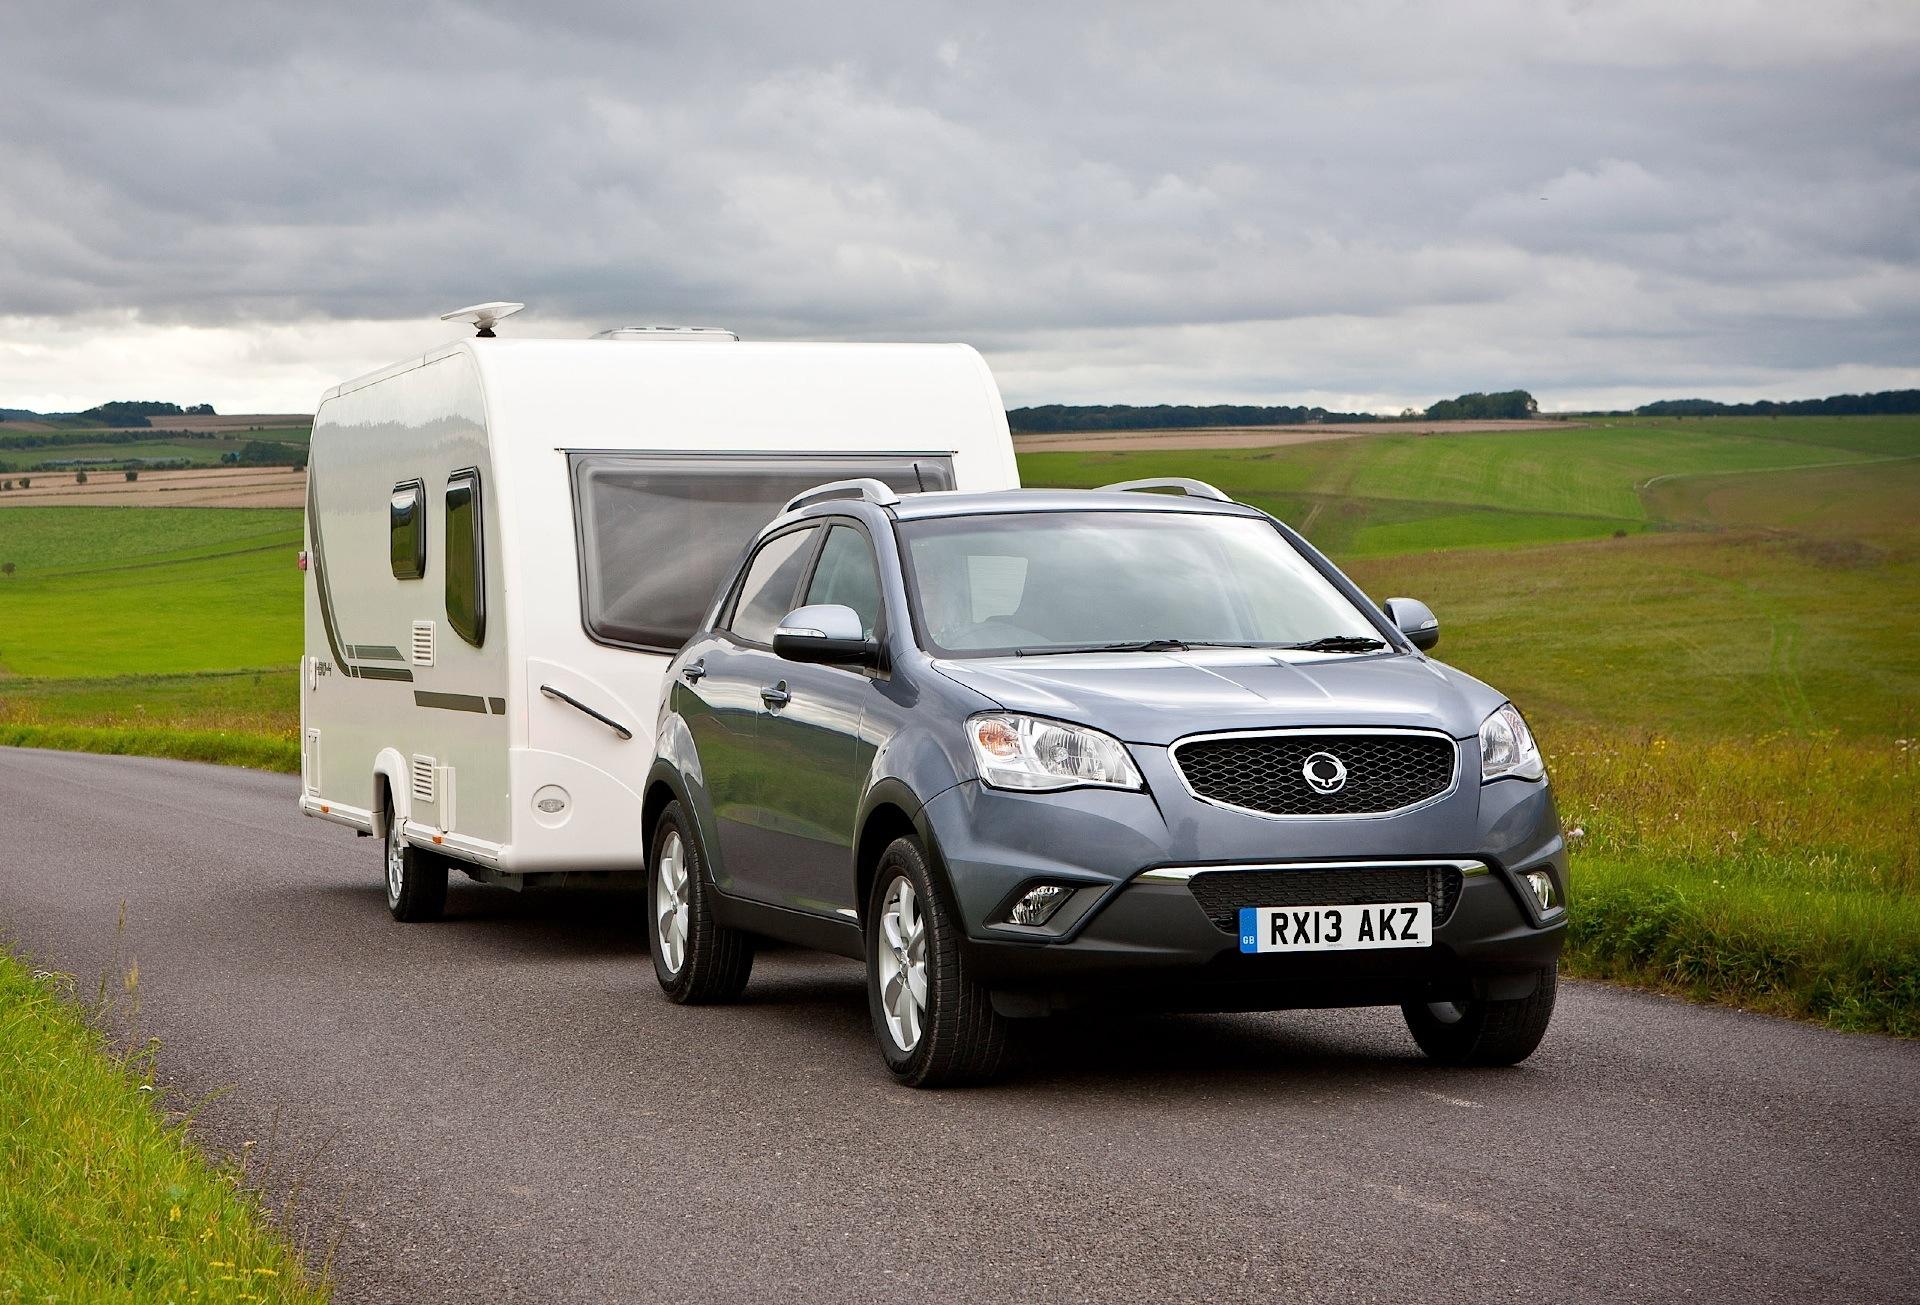 Sports Cars Towing Caravans